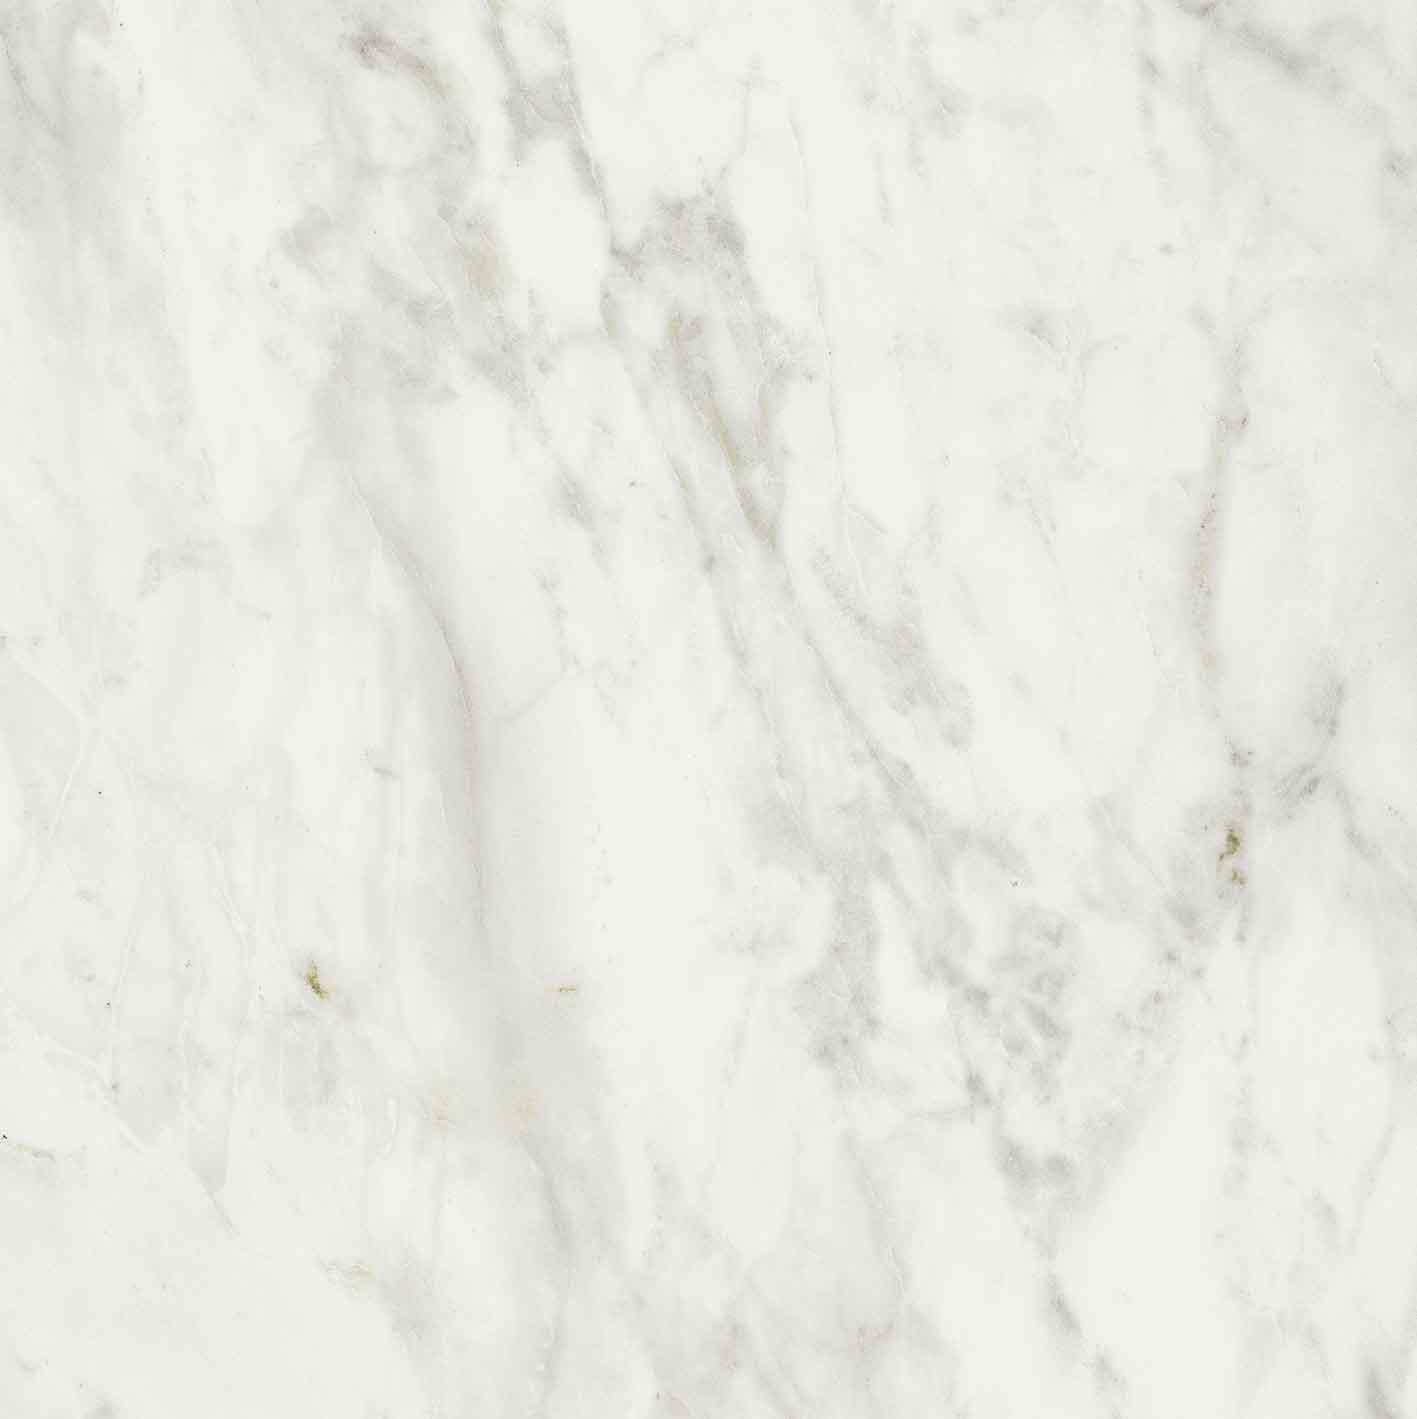 Exalt of Cerim Magic White Glossy 10mm 60 x 60